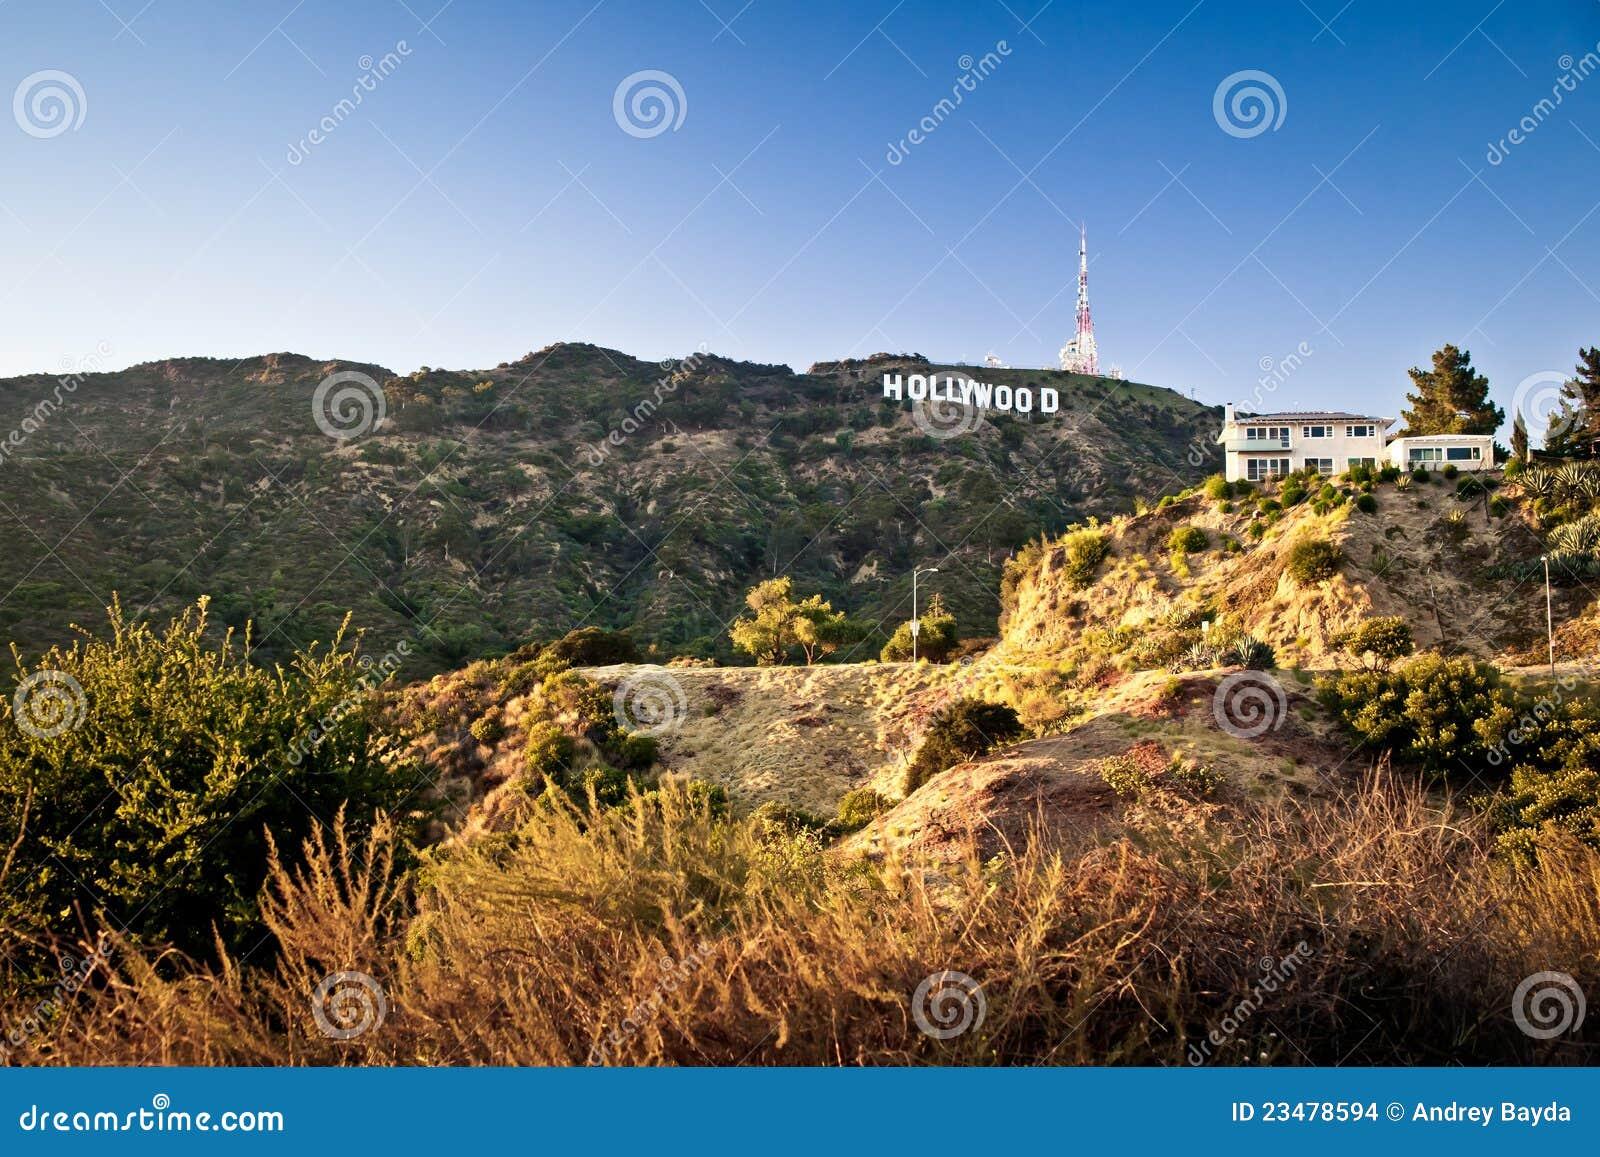 Angeles hollywood los teckensikt